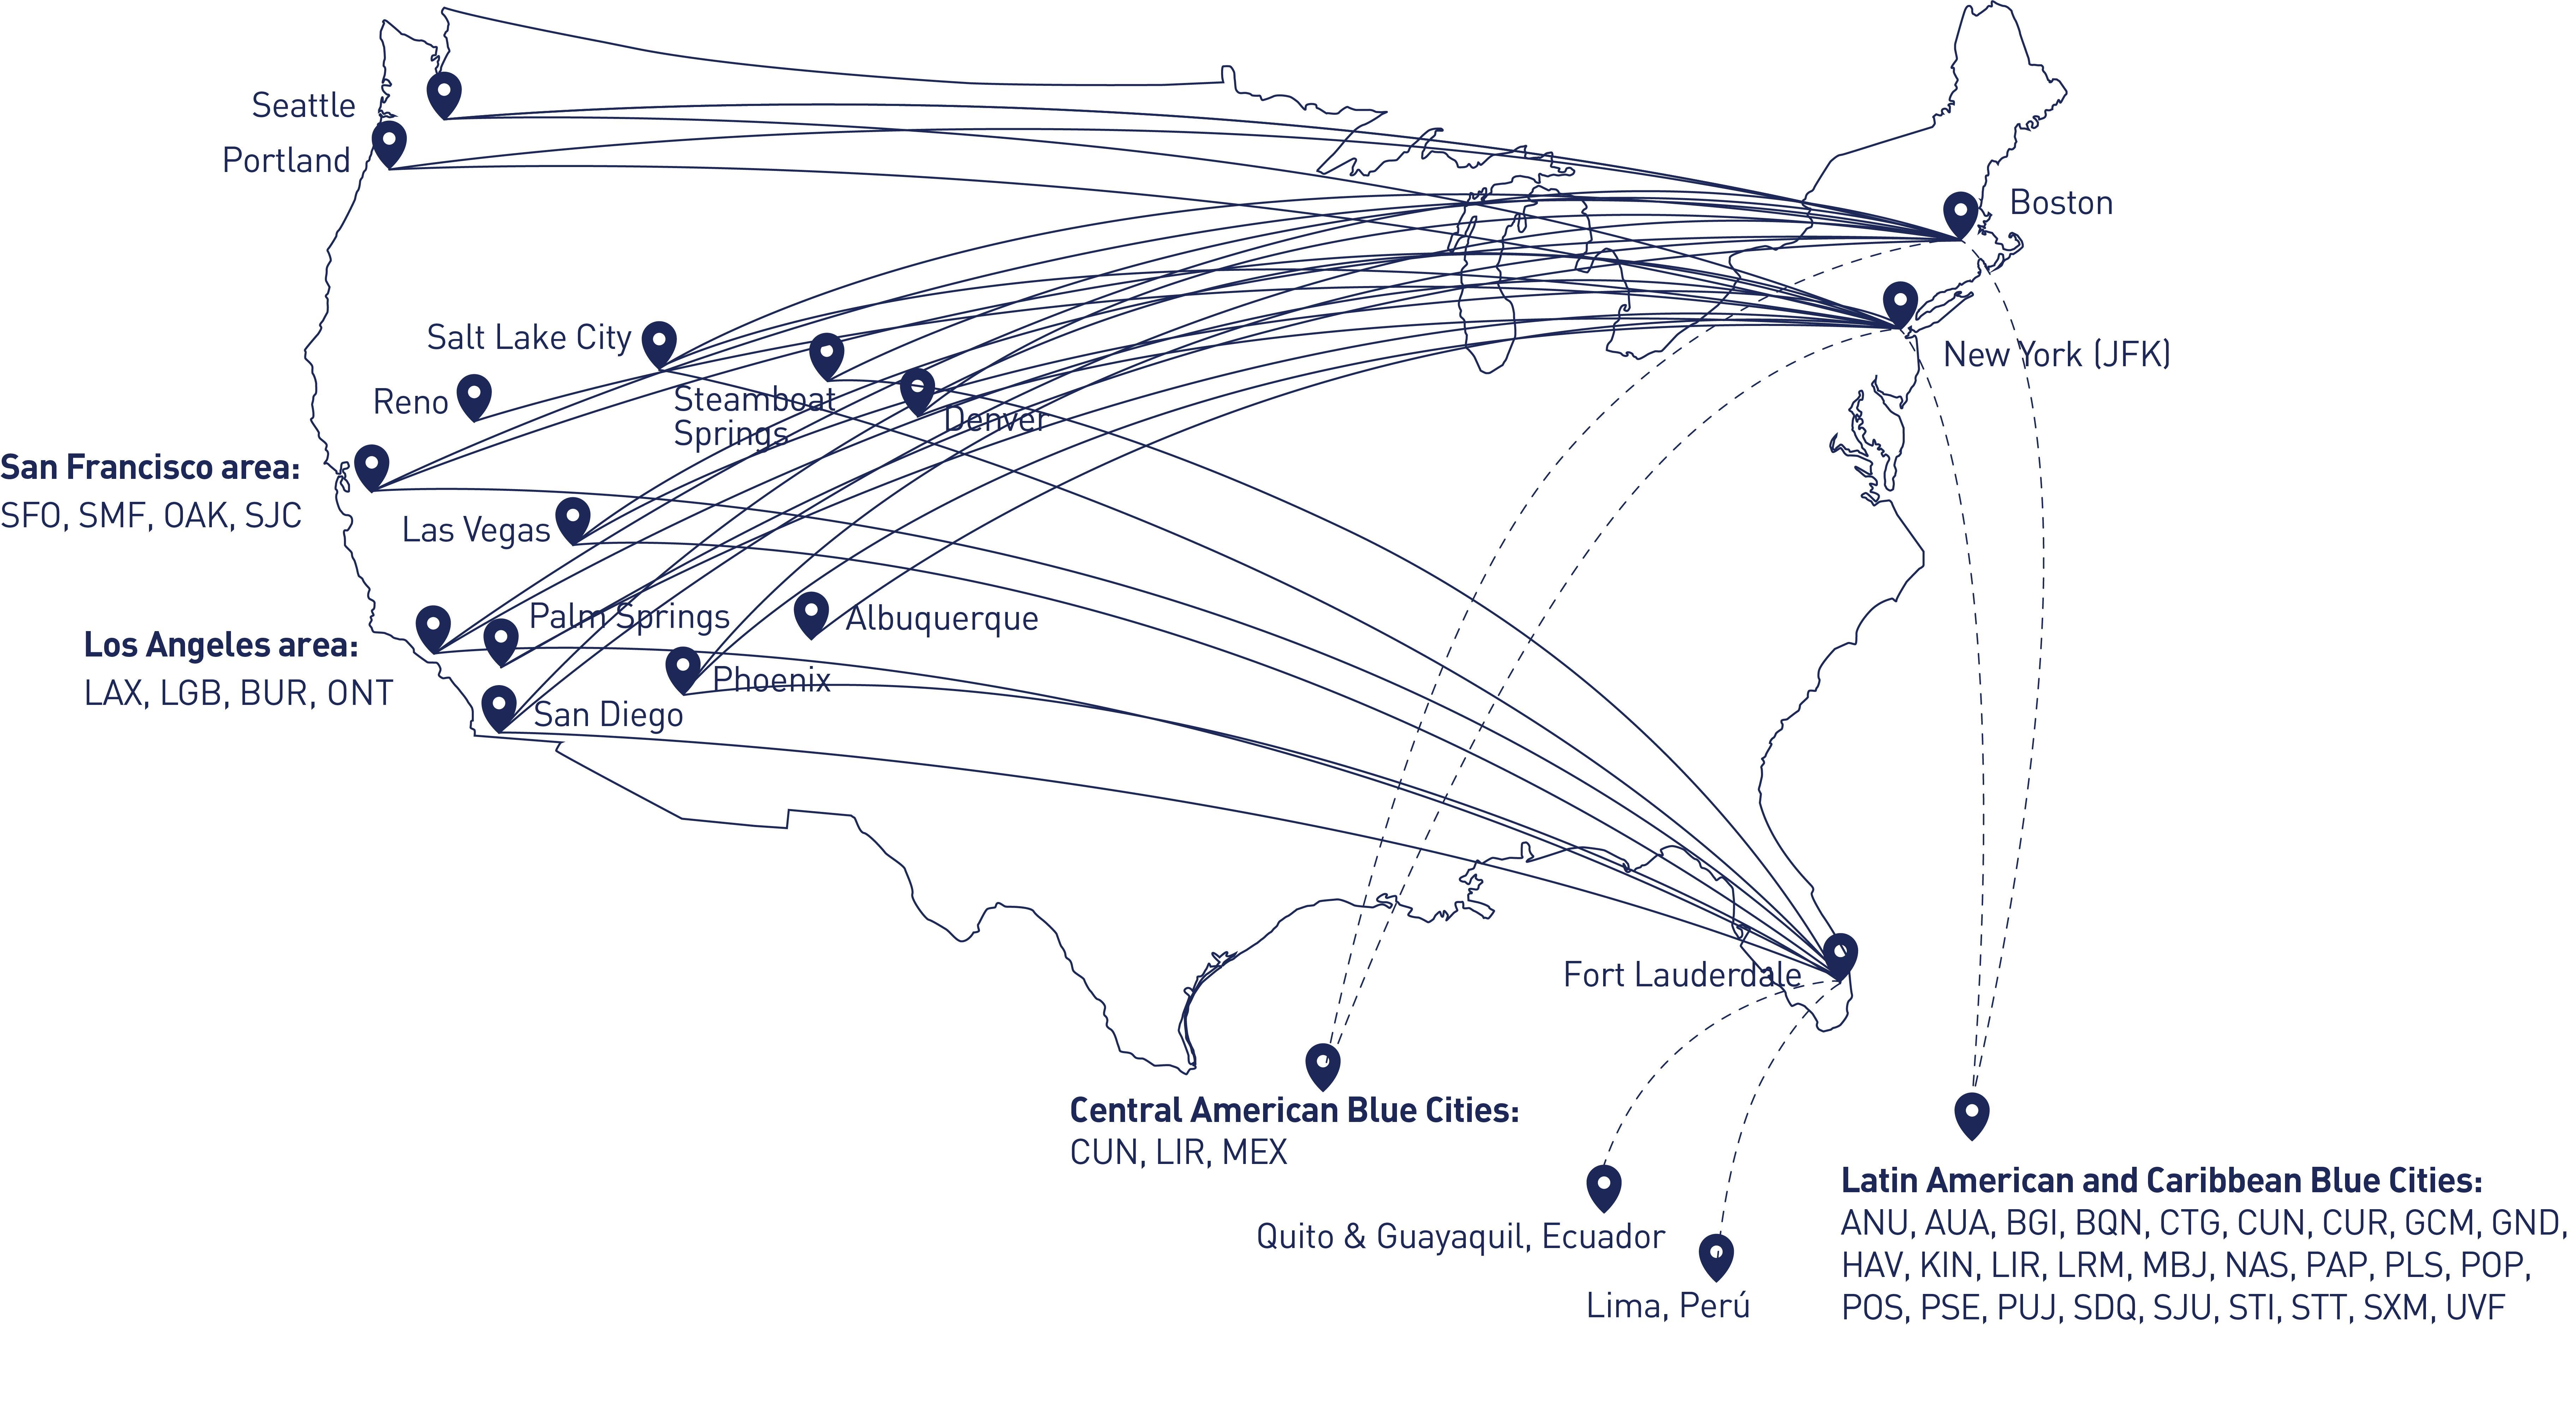 mapa de opciones EatUp Café en vuelos de JetBlue